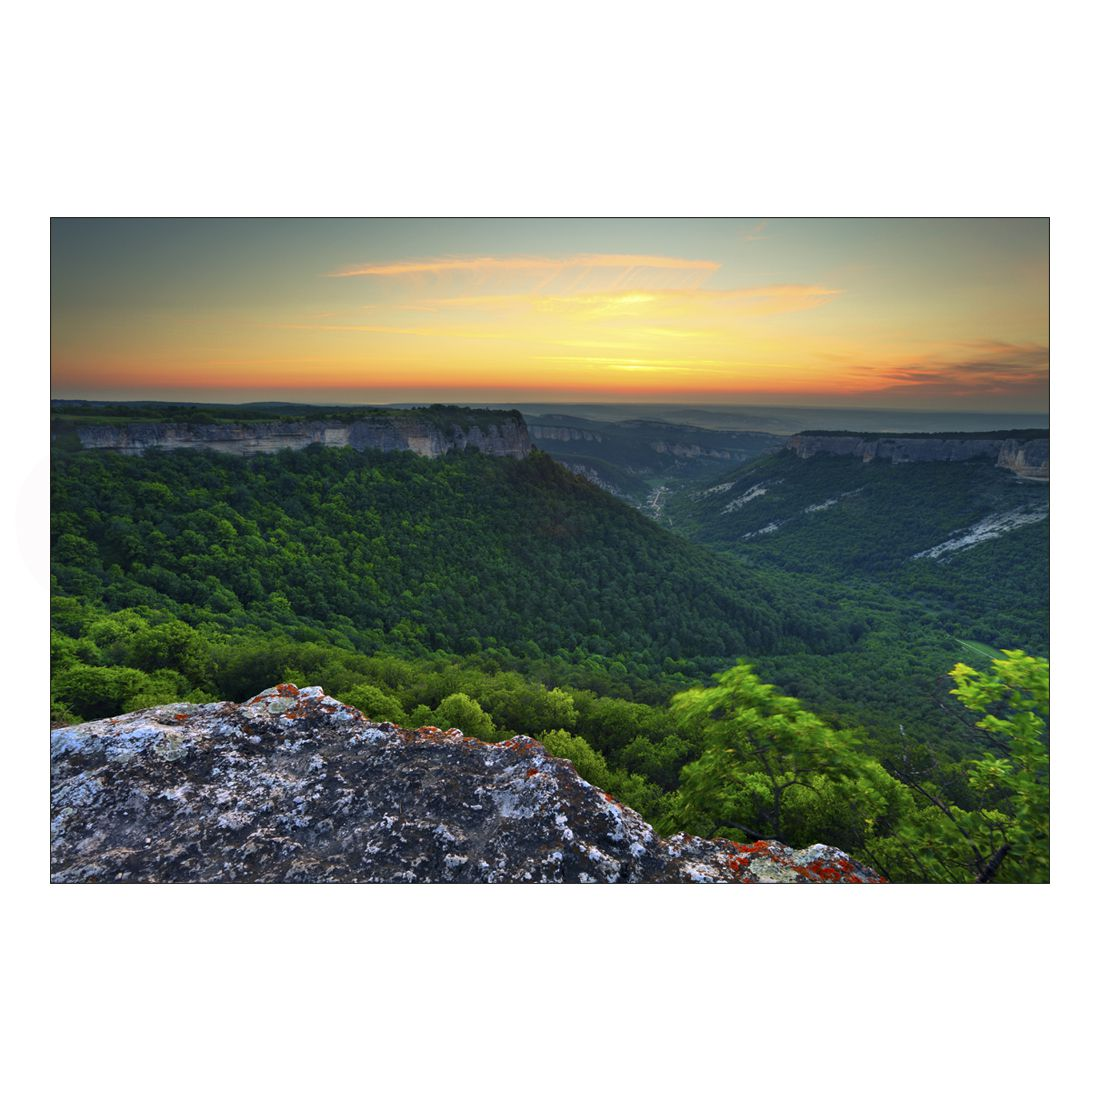 Acrylglasbild Mountain View – Abmessung 60×40 cm, Gallery of Innovative Art kaufen